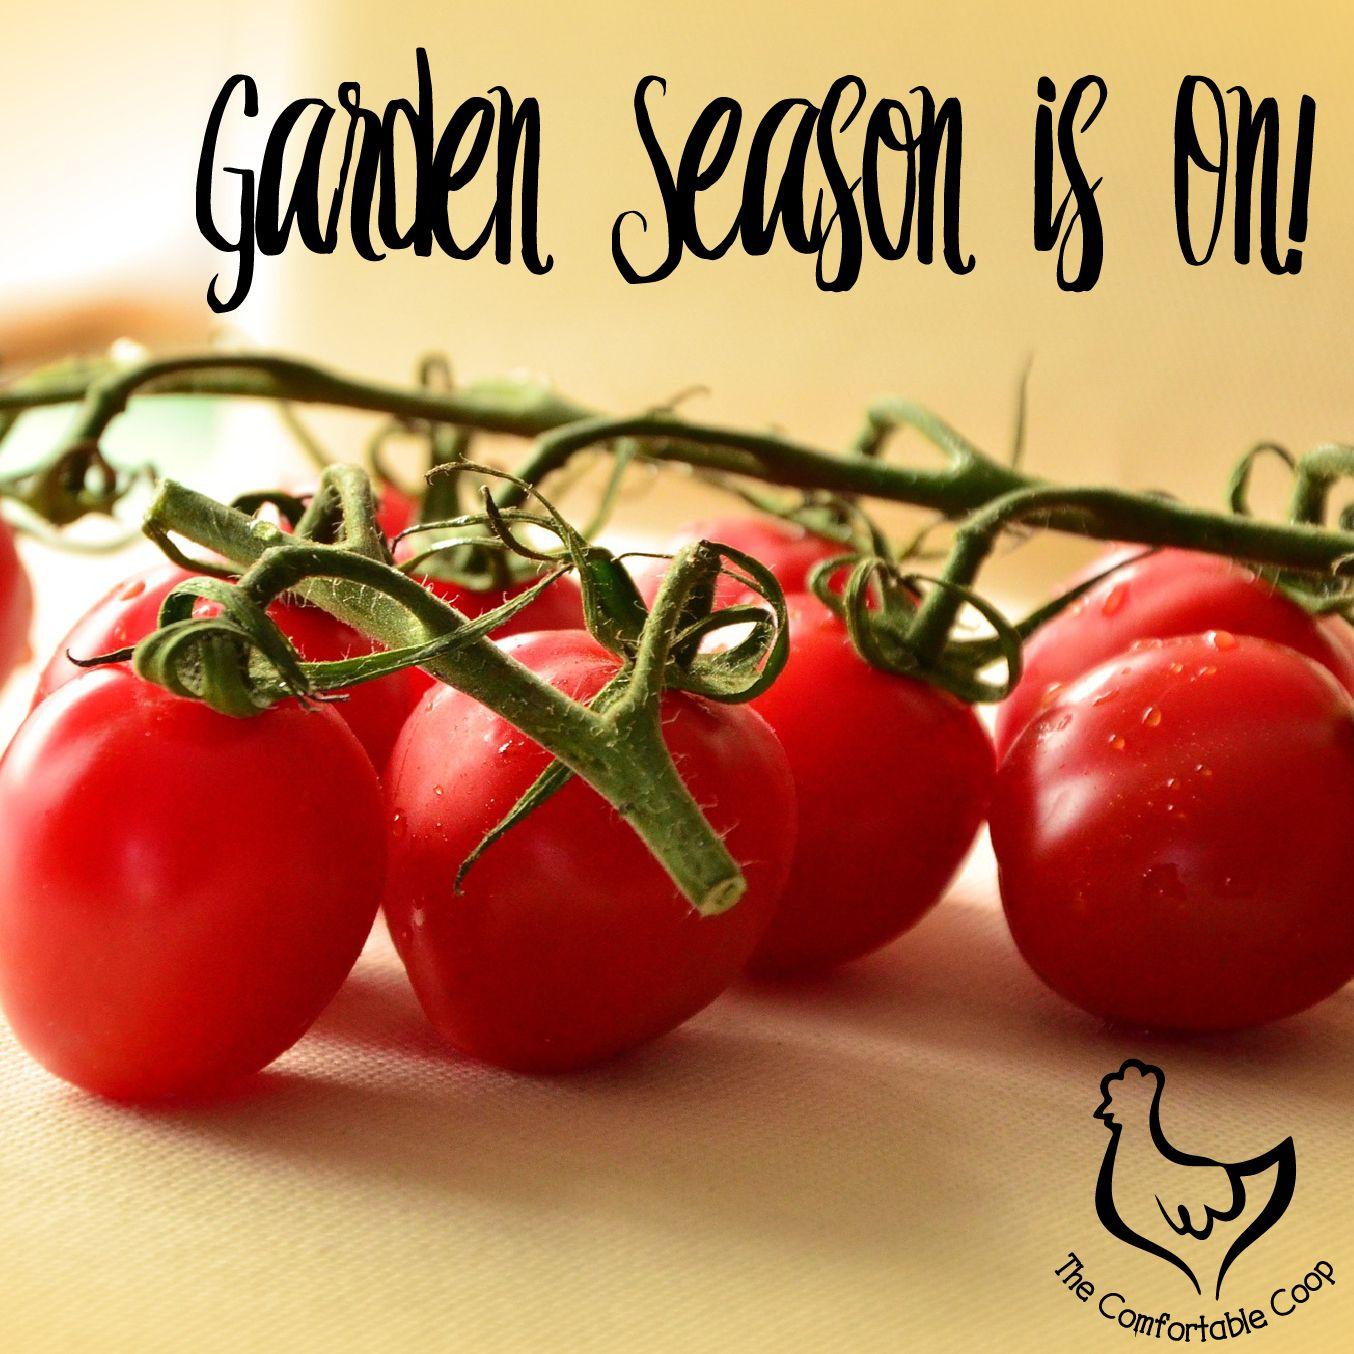 Garden Season Is On Tomato Red Food Food